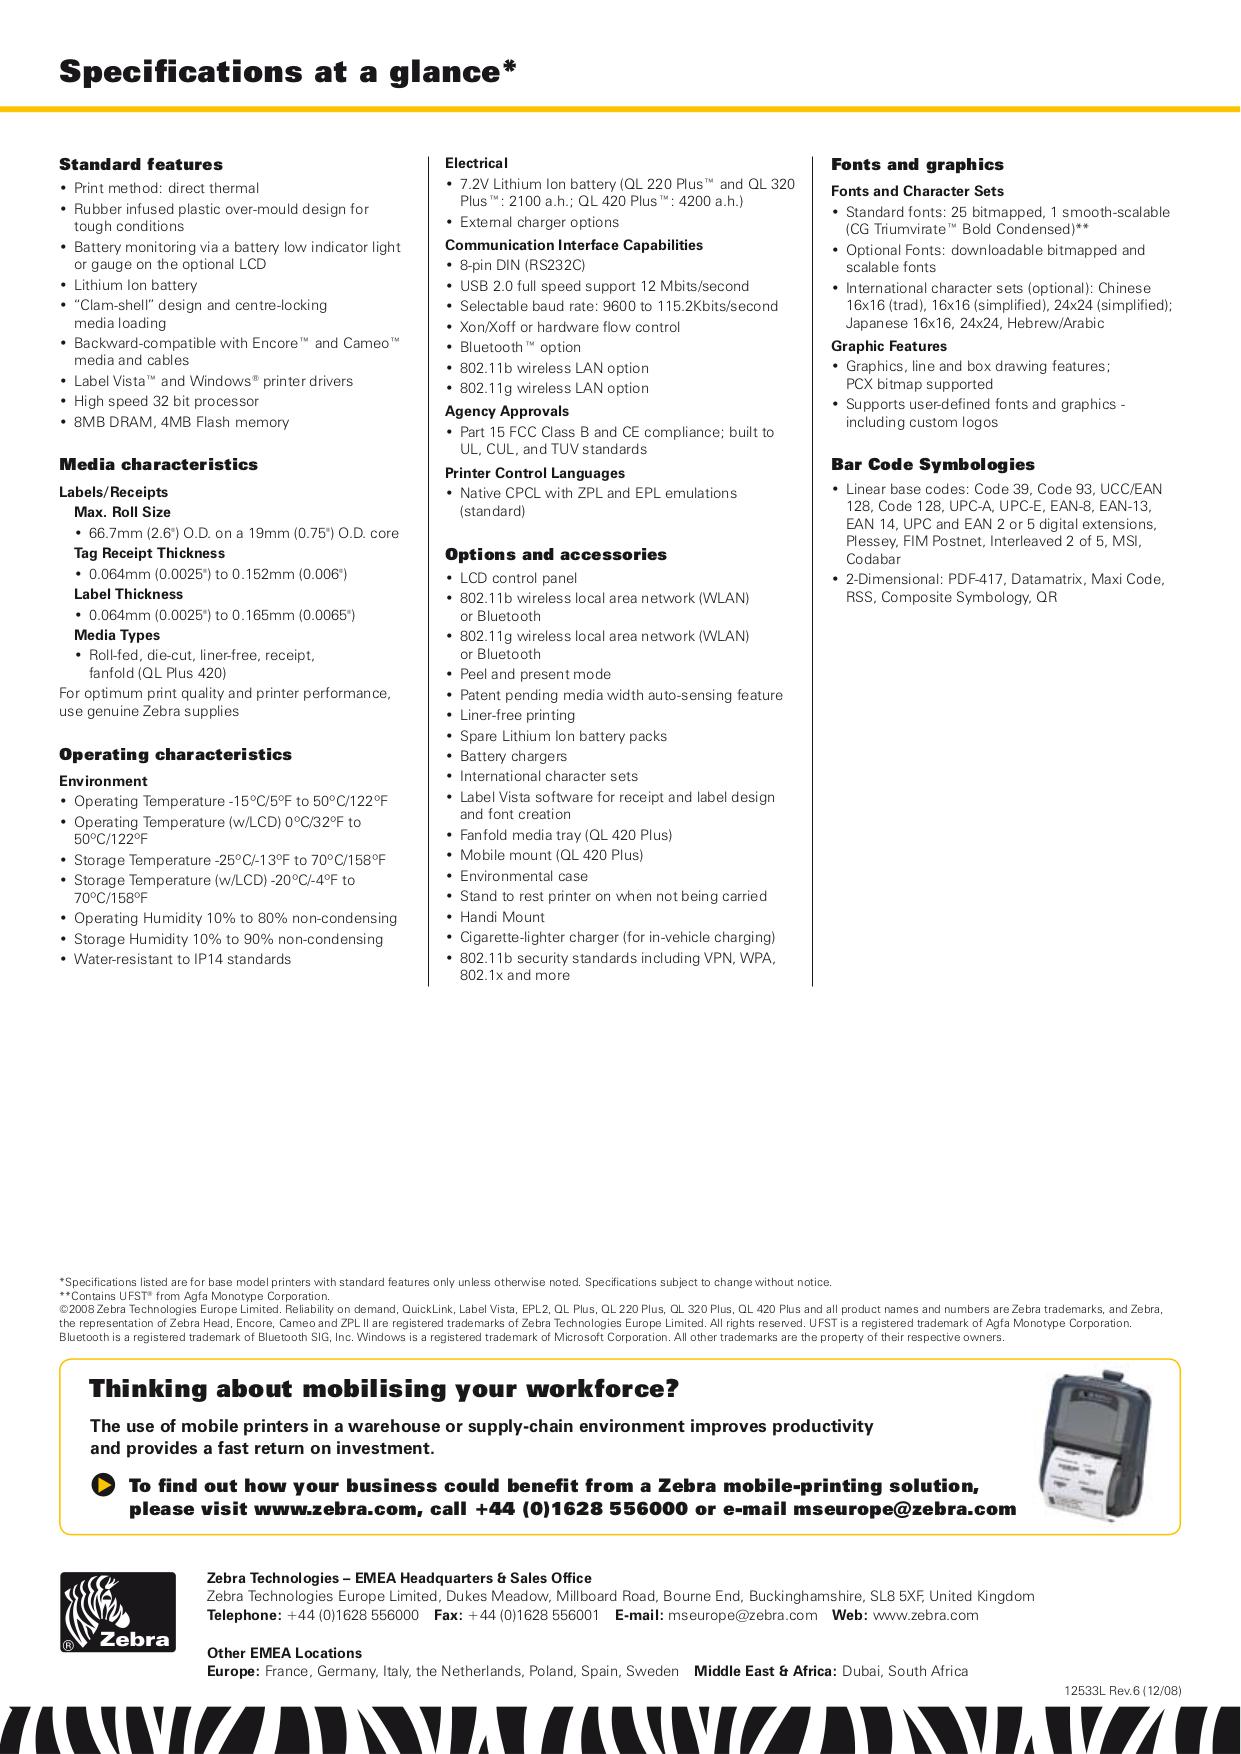 Pdf manual for zebra printer ql420 plus zebra printer ql420 plus pdf page preview fandeluxe Gallery